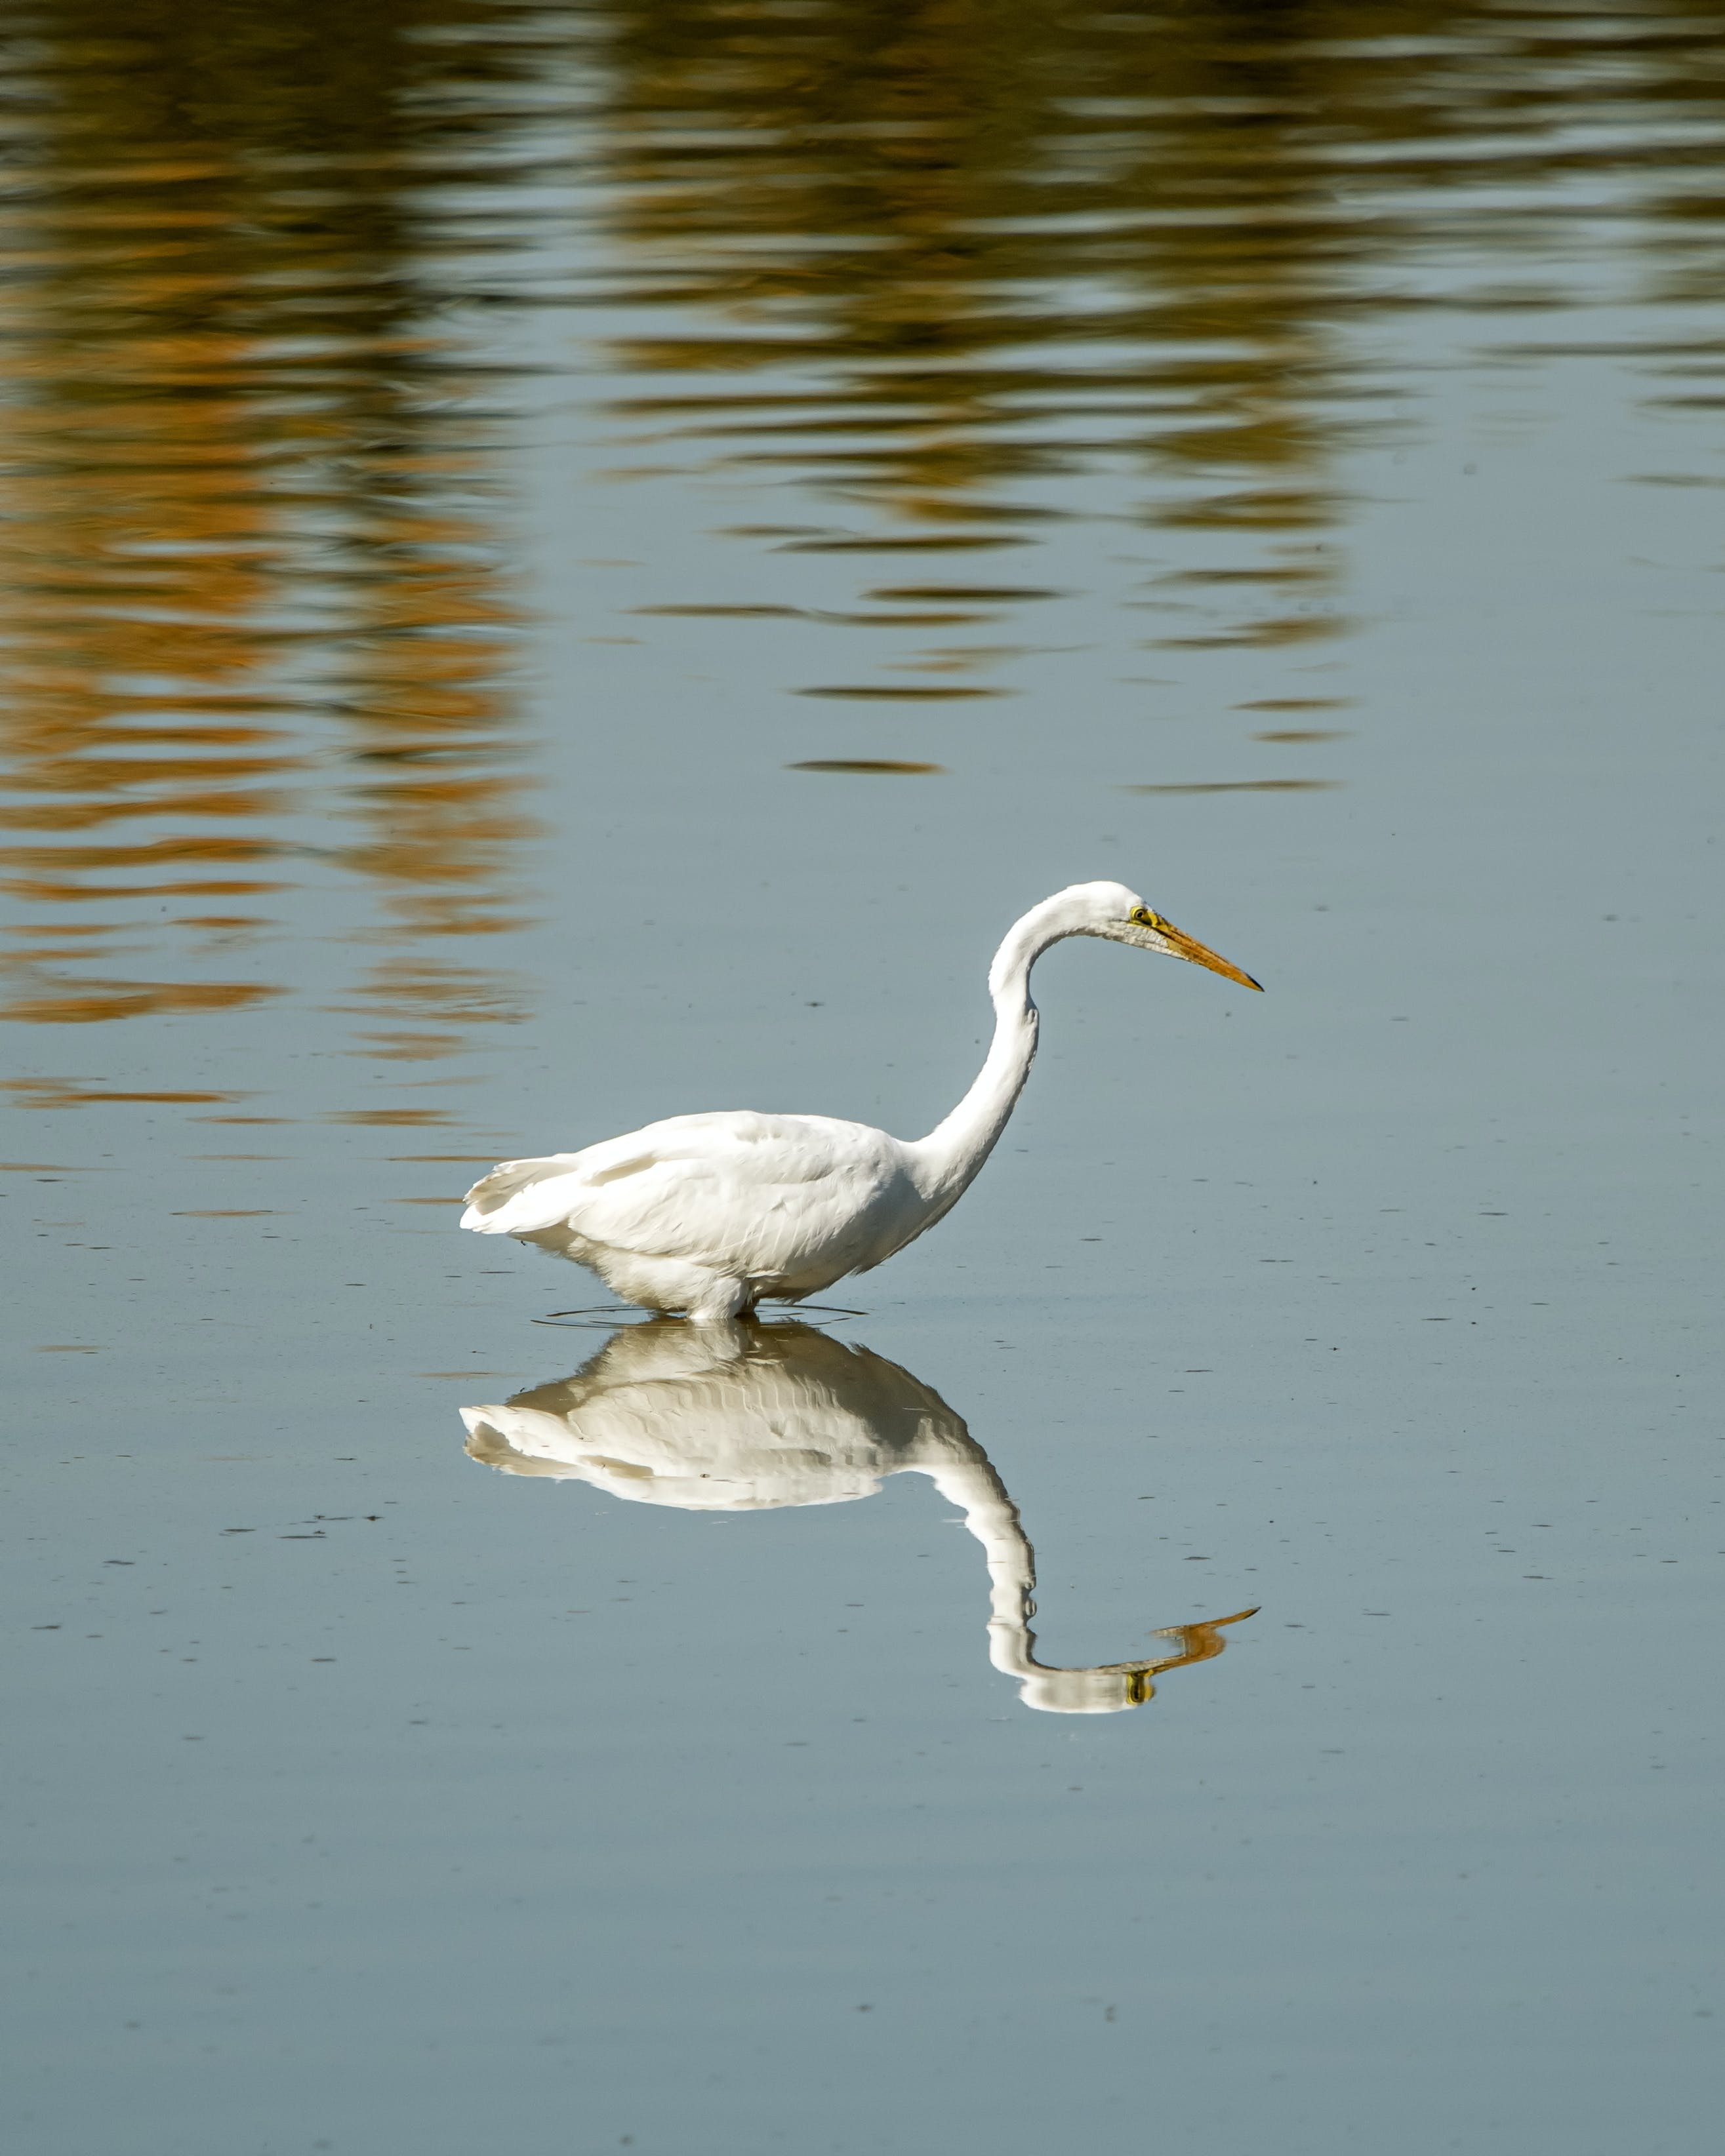 Free stock photo of bird, reflection, white egret